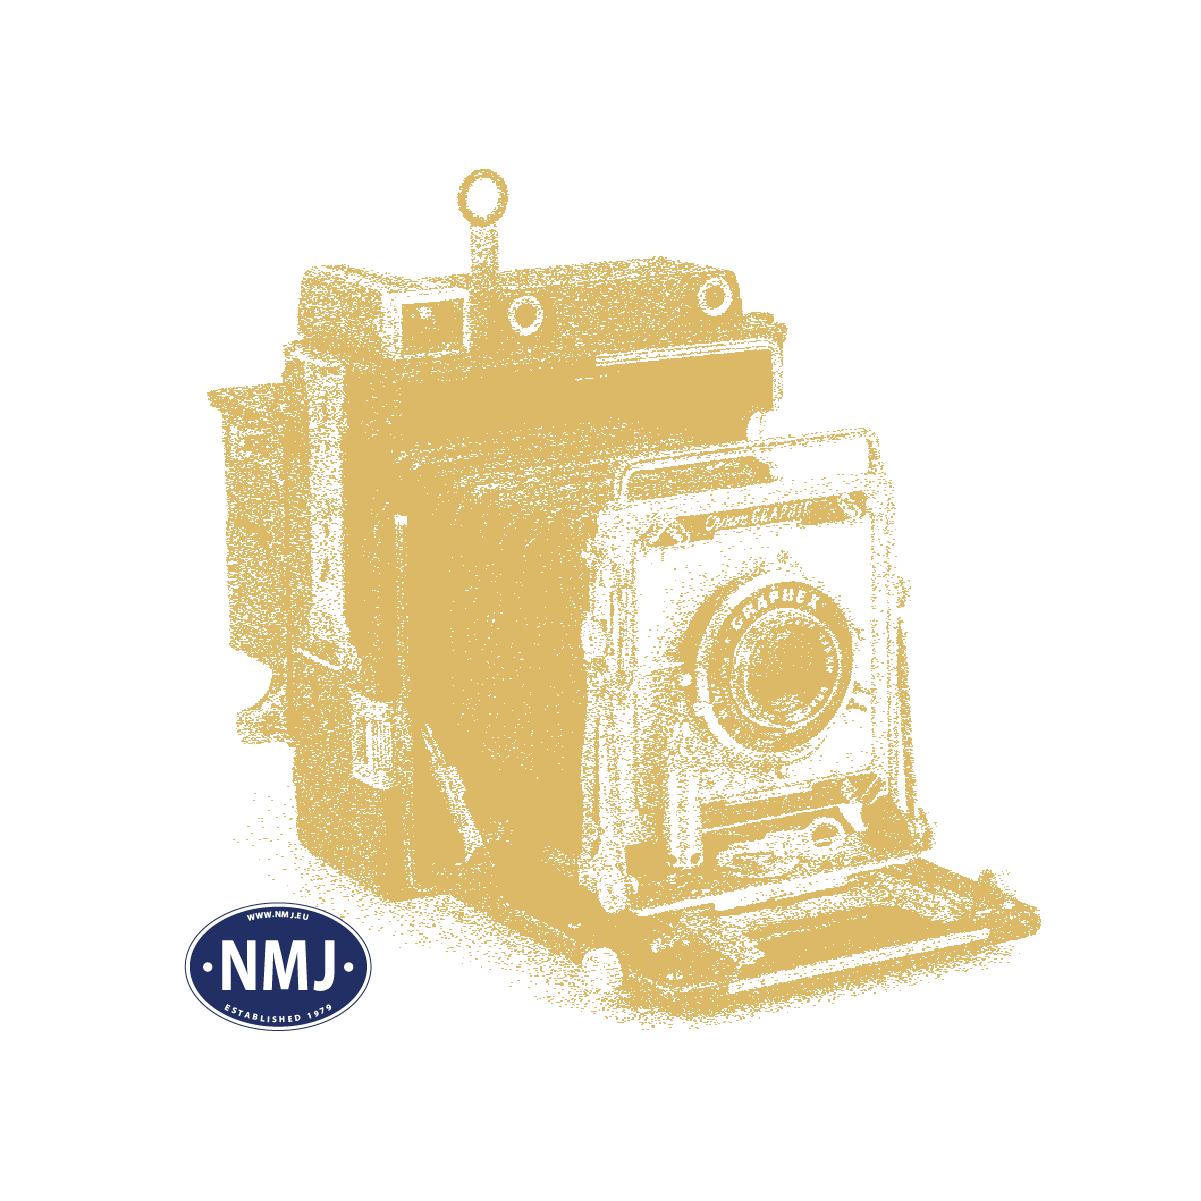 ART6870243 - M88 Bergepanzer olivgrün (früh)